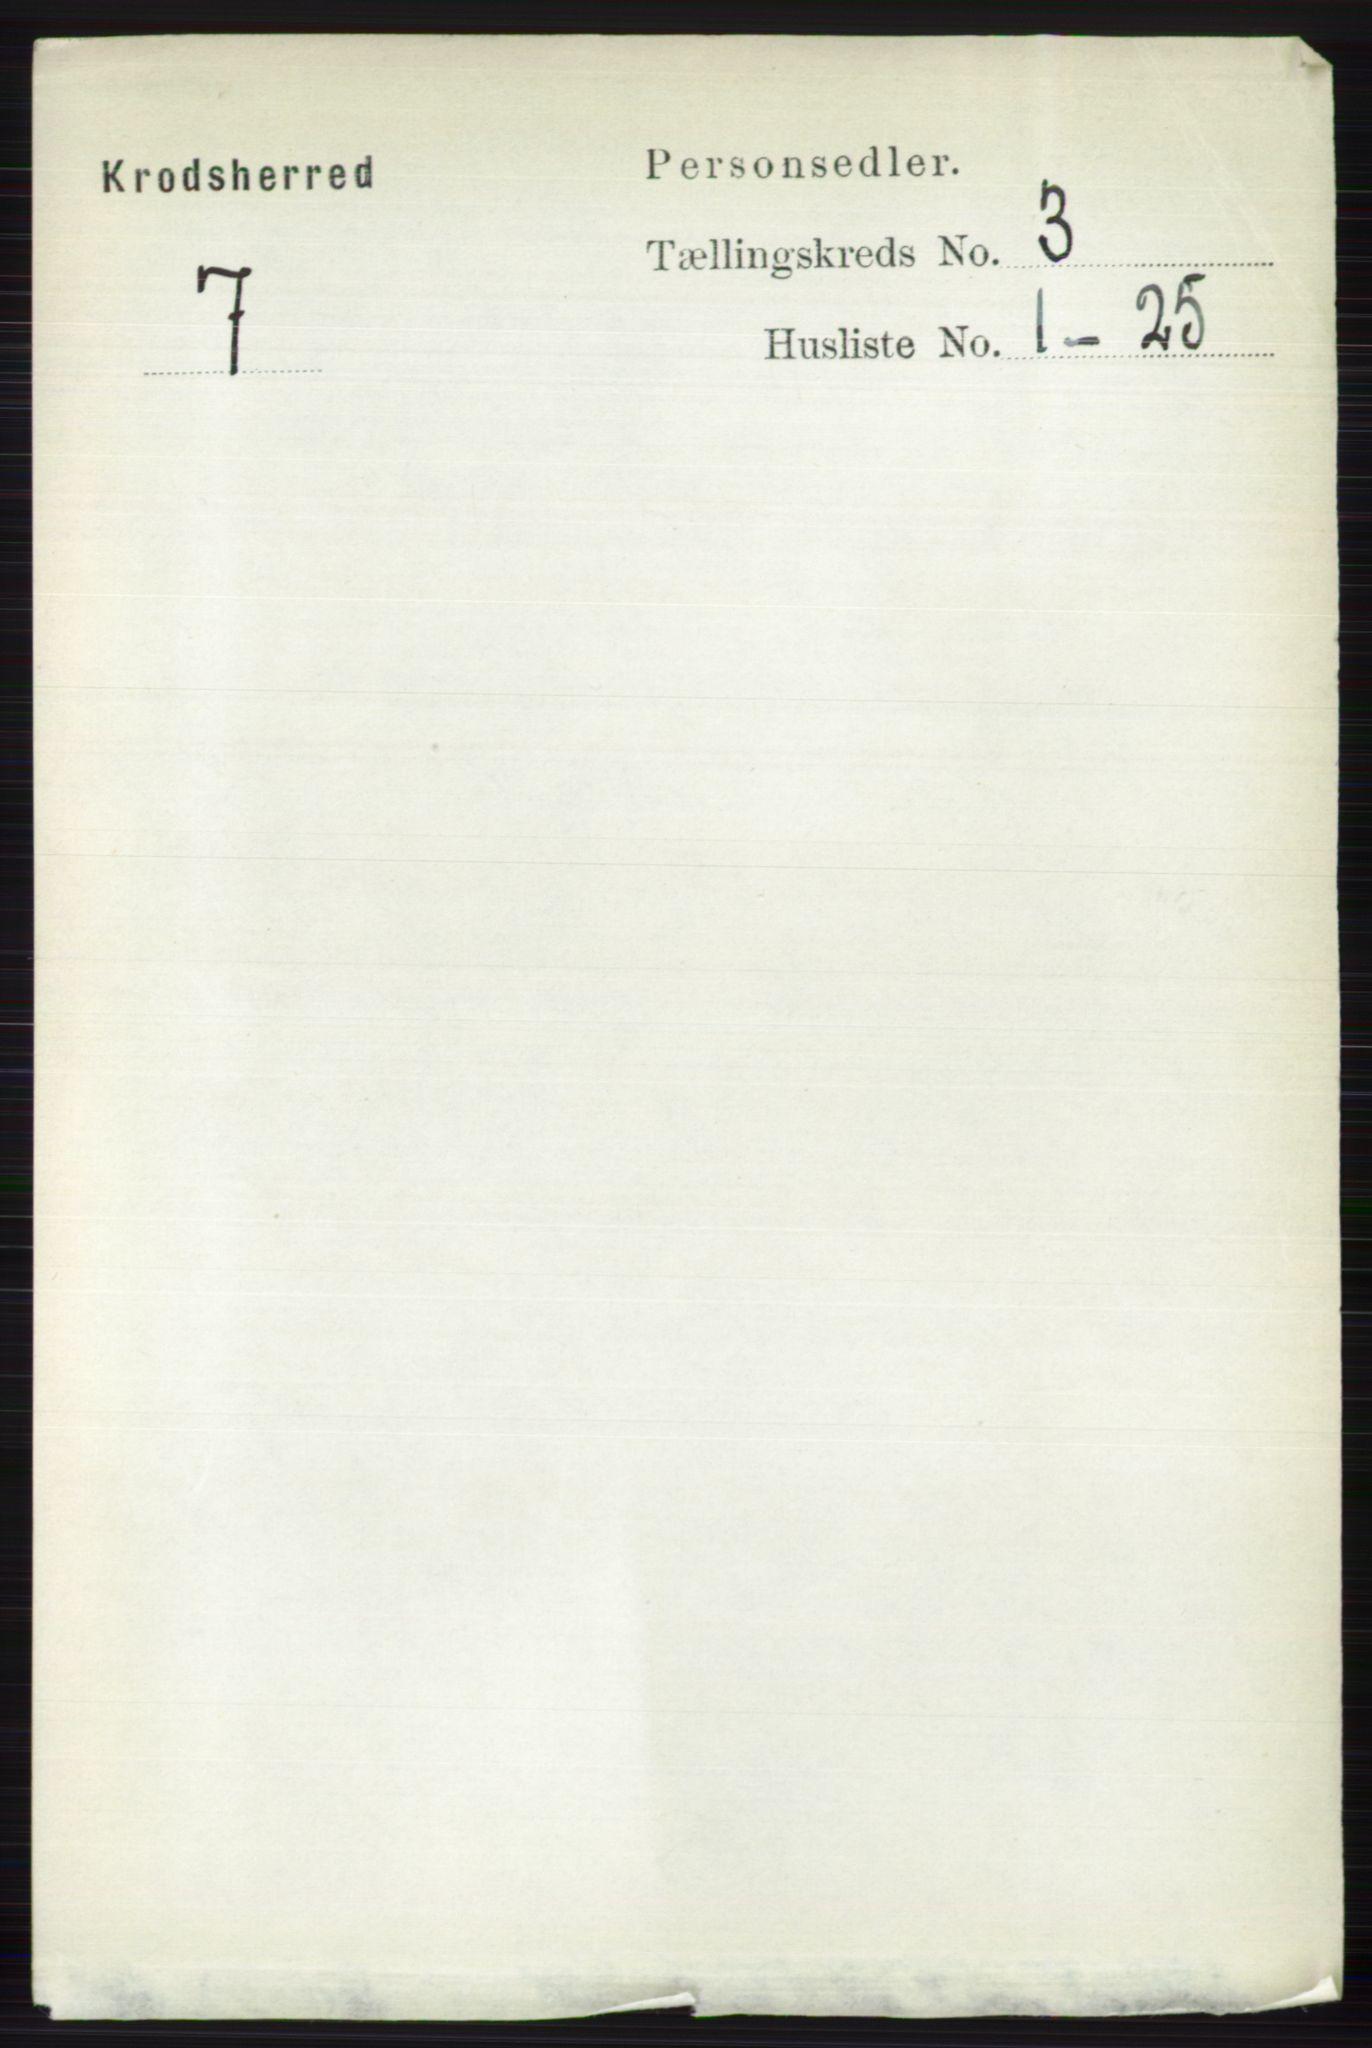 RA, Folketelling 1891 for 0621 Sigdal herred, 1891, s. 5577